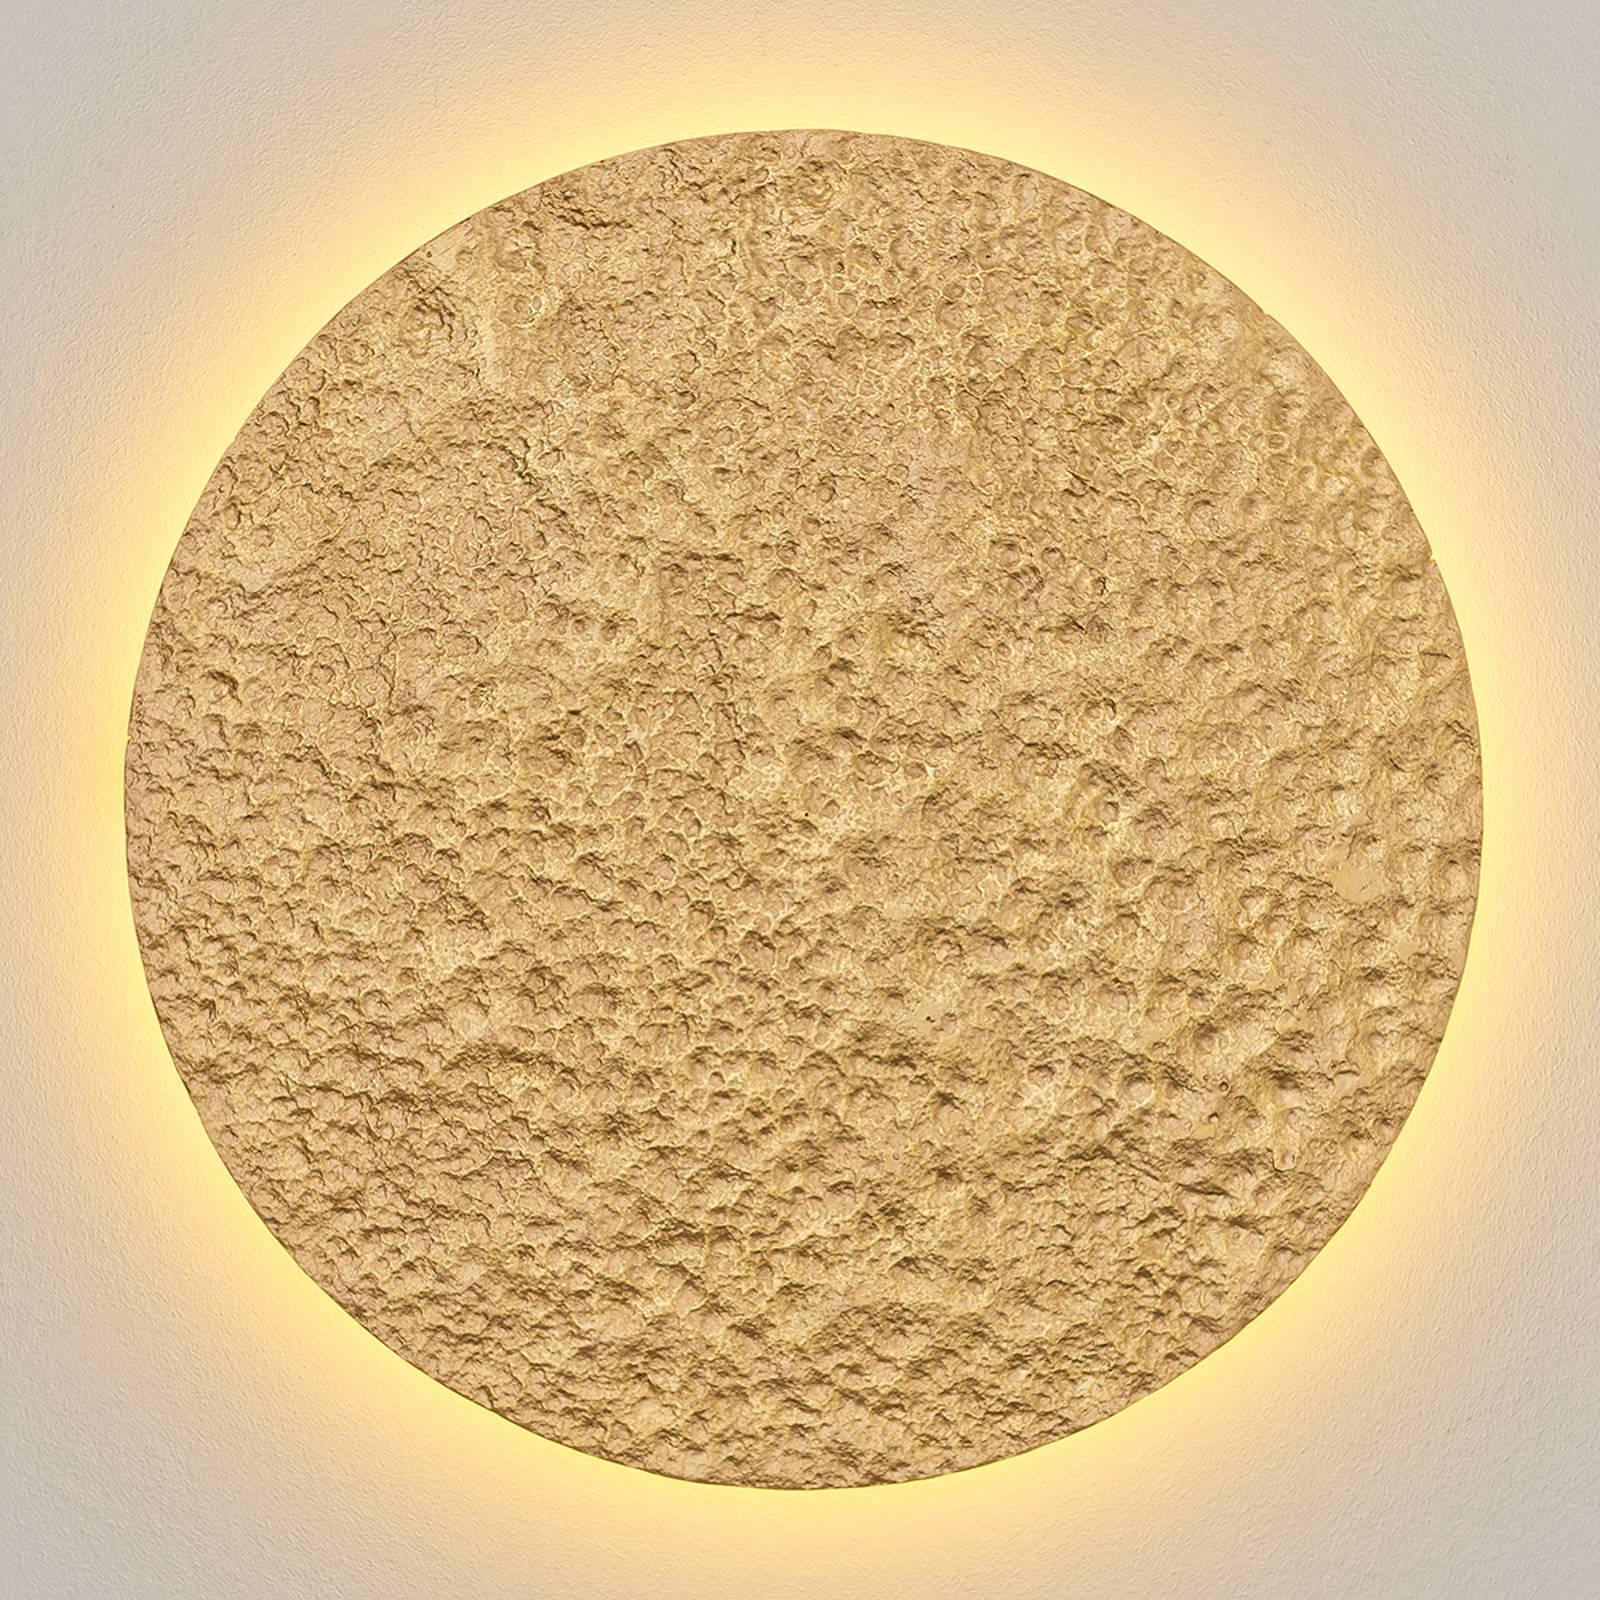 Meteor-LED-seinävalaisin, Ø 55 cm, kulta